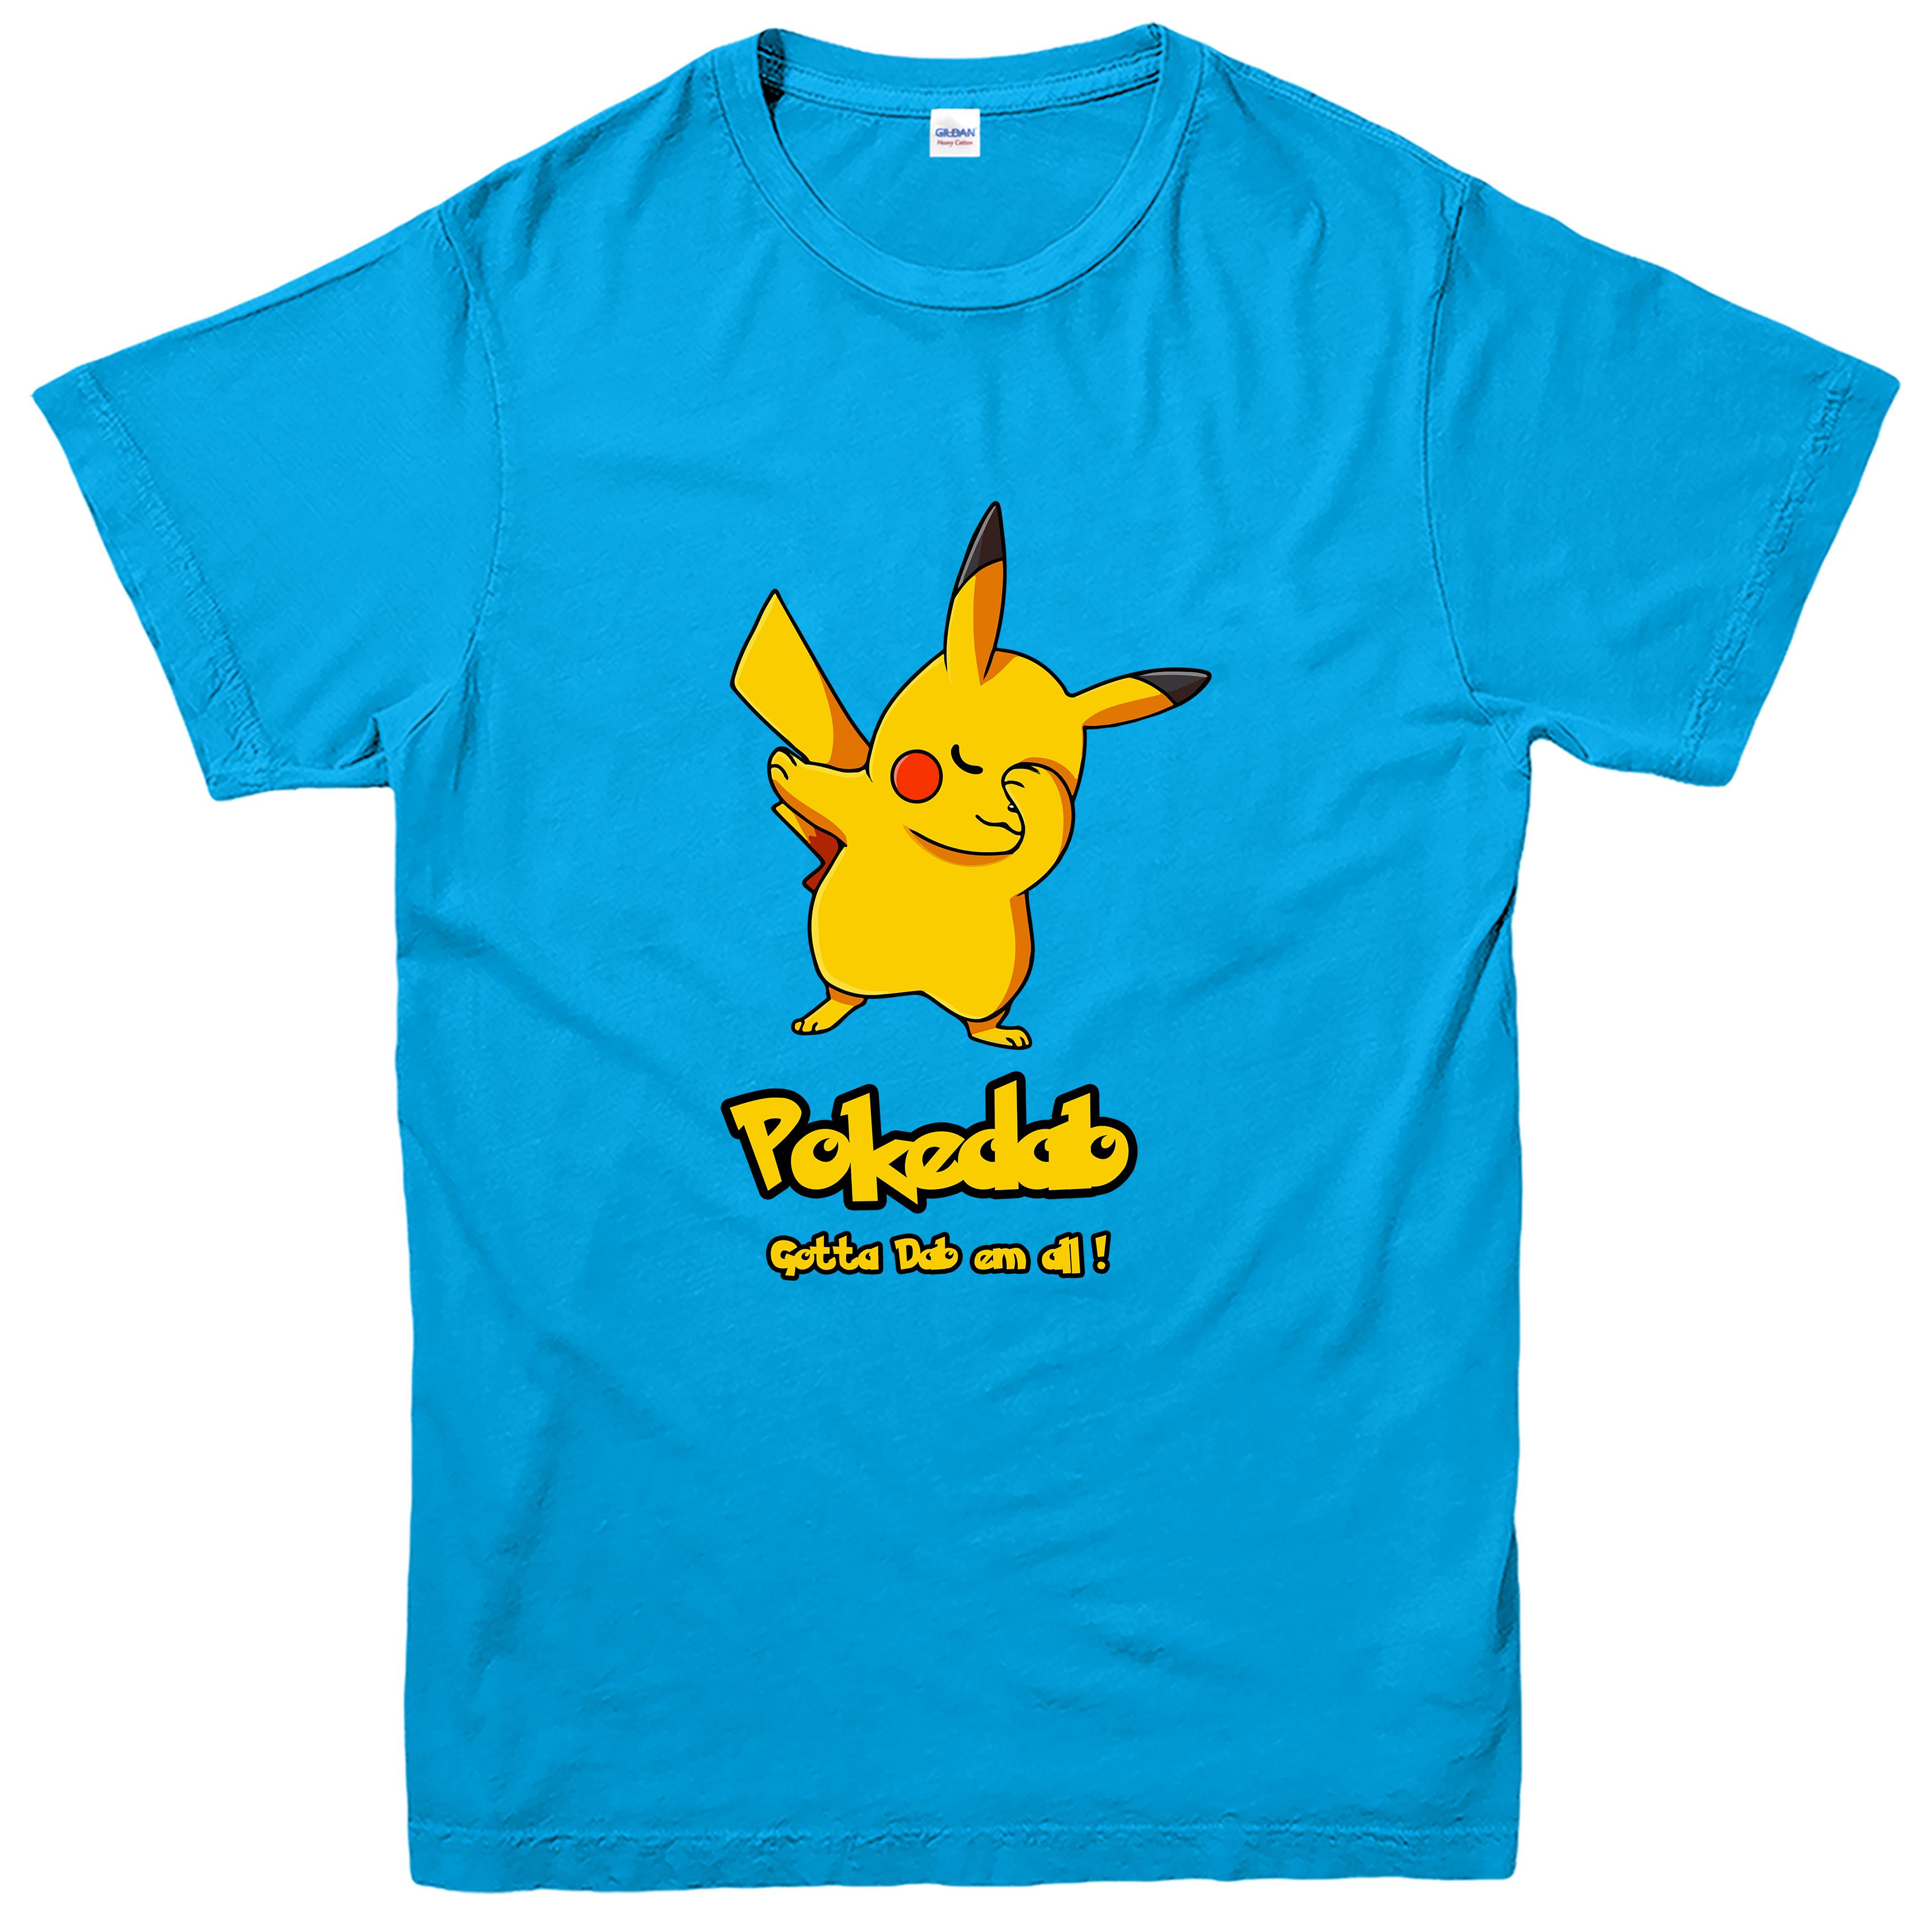 Well-liked Pokedab T-shirt, Pikachu Pokemon Dab em all Spoof Tee Top | eBay FJ46